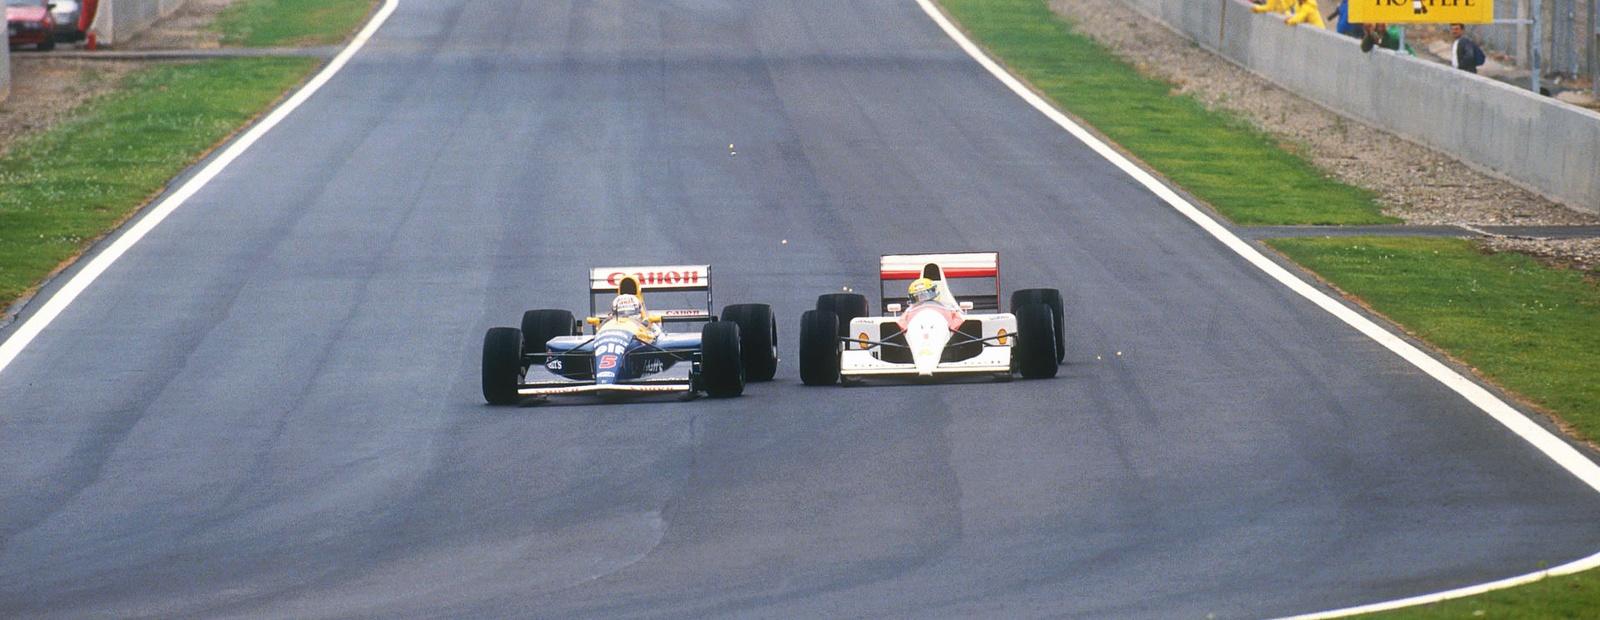 McLaren's greatest wheel-to-wheel battles